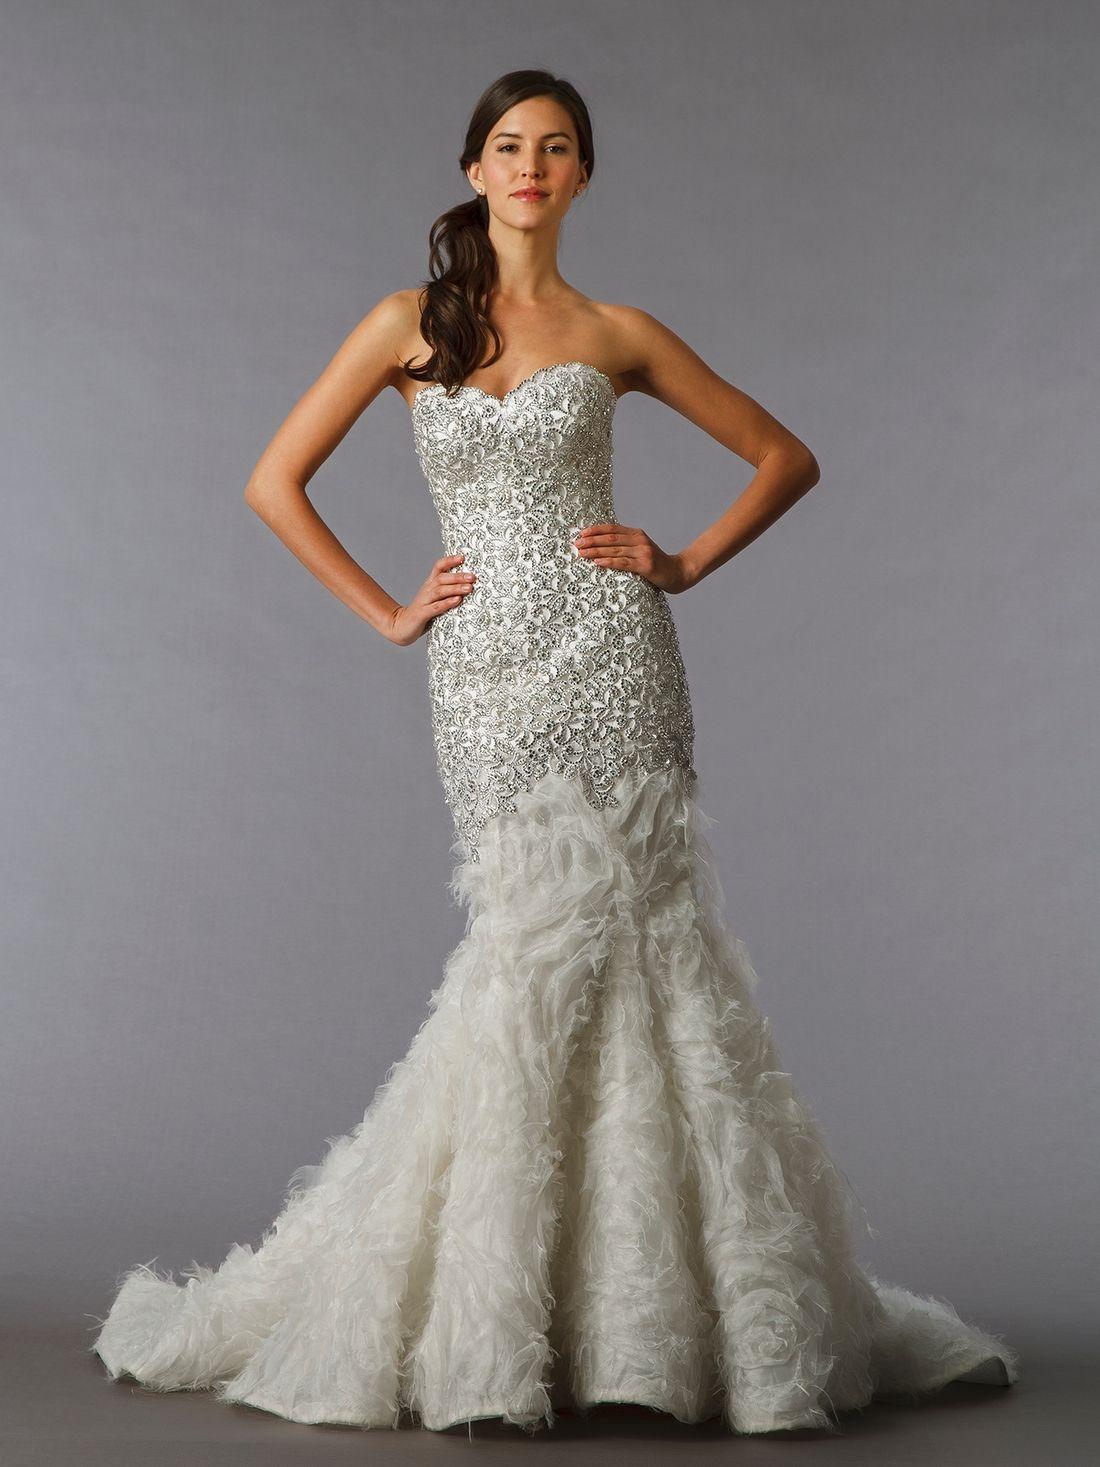 Superb KleinfeldBridal Pnina Tornai Bridal Gown Mermaid Dropped Waist